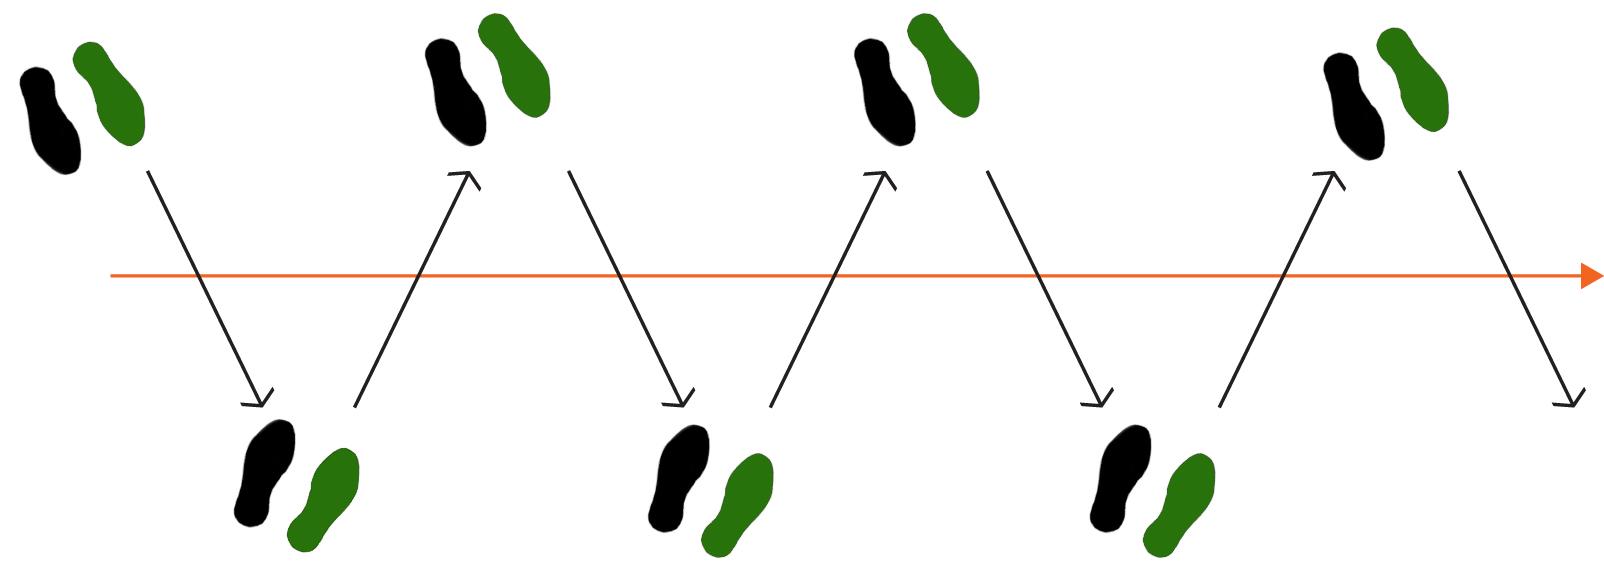 Waltz Dance Steps Diagram Tango